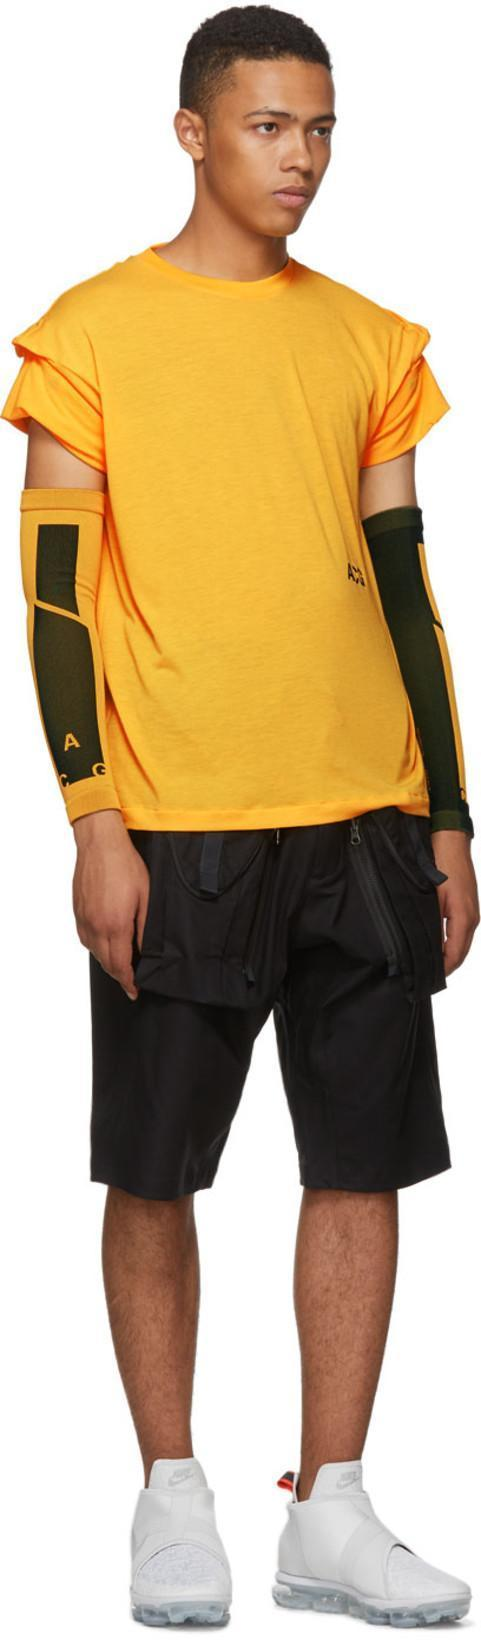 5a18342f Nike Lab Orange Nrg Acg Variable T-Shirt In Laser Orang | ModeSens